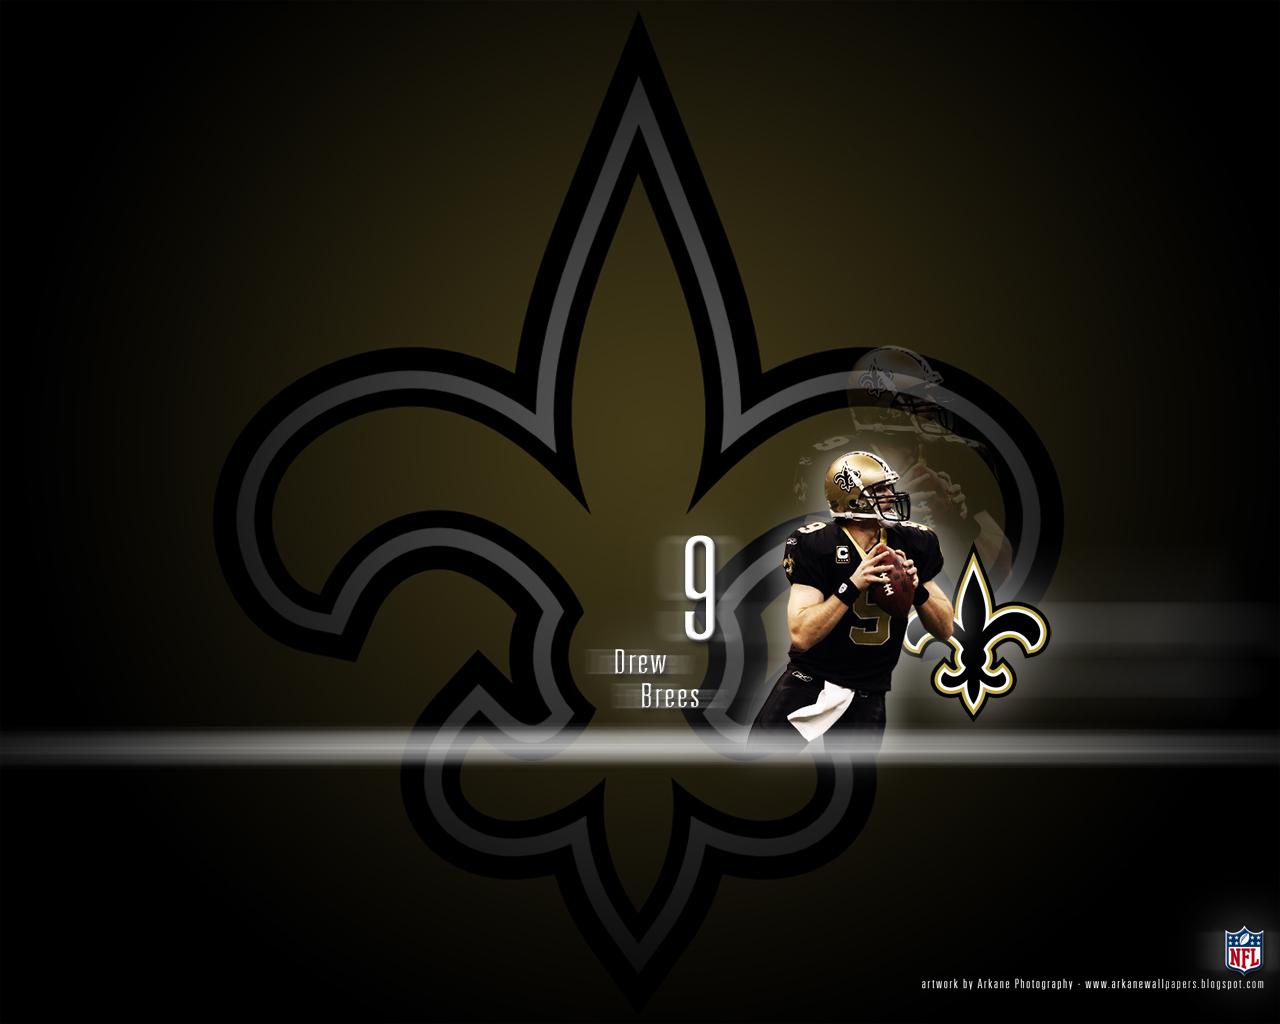 Free Download New Orleans Saints Wallpaper Wallpaper New Orleans